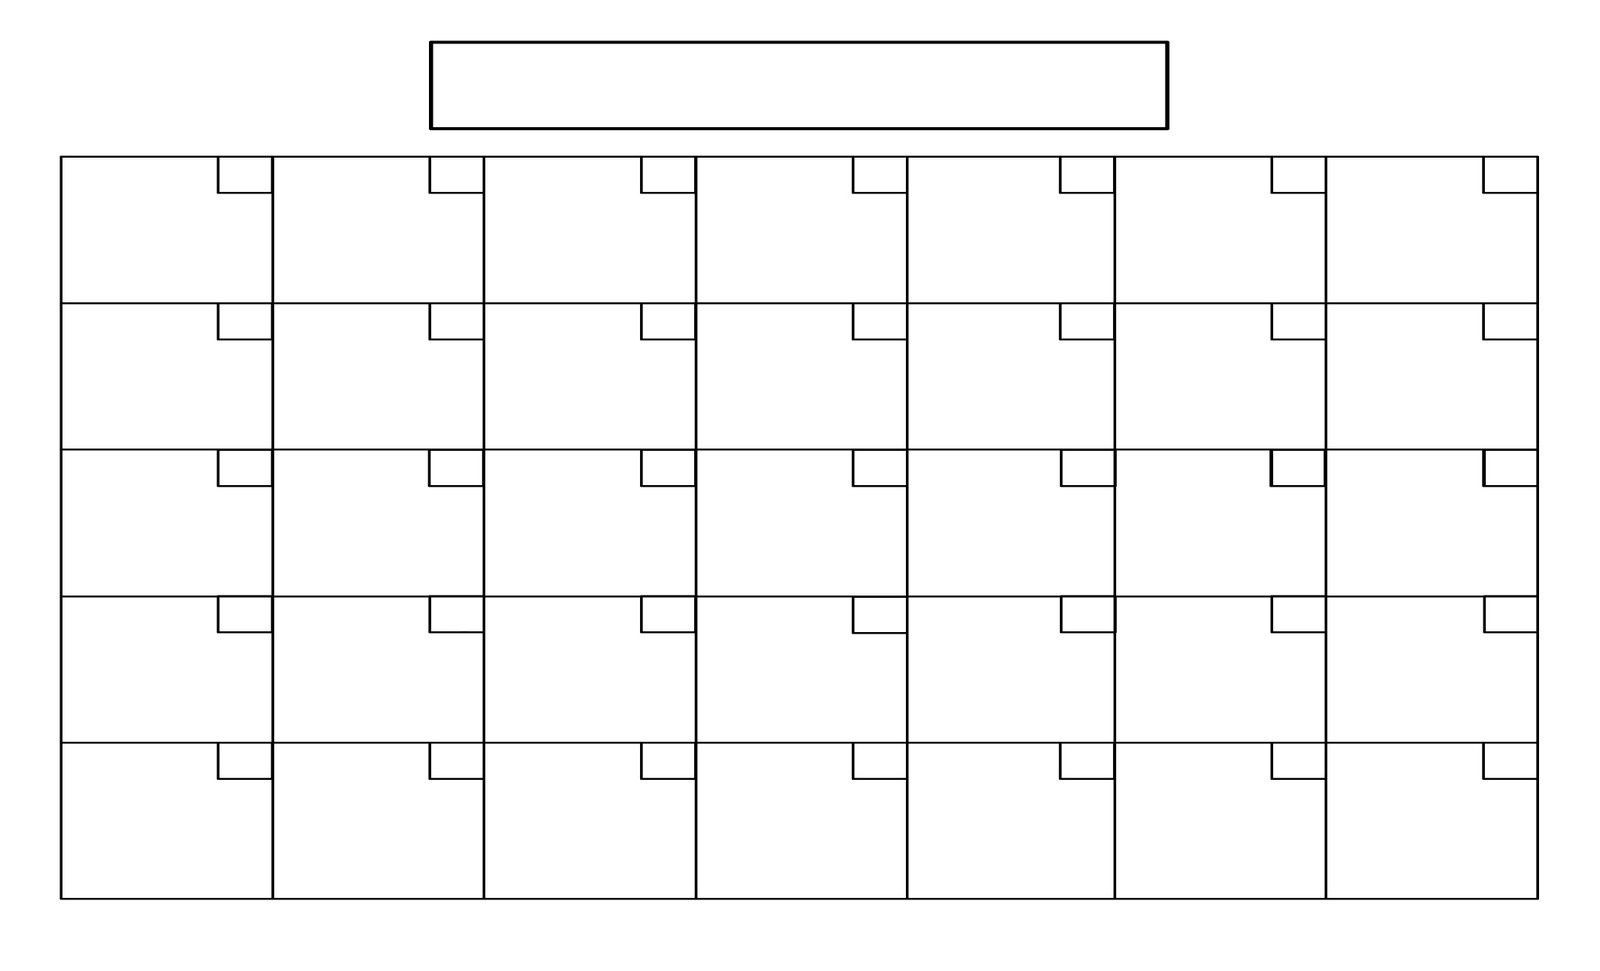 8X11 Printable Blank Calendar   Calendar Template 2020  Free Printable Blank Monthly Calendar Templates